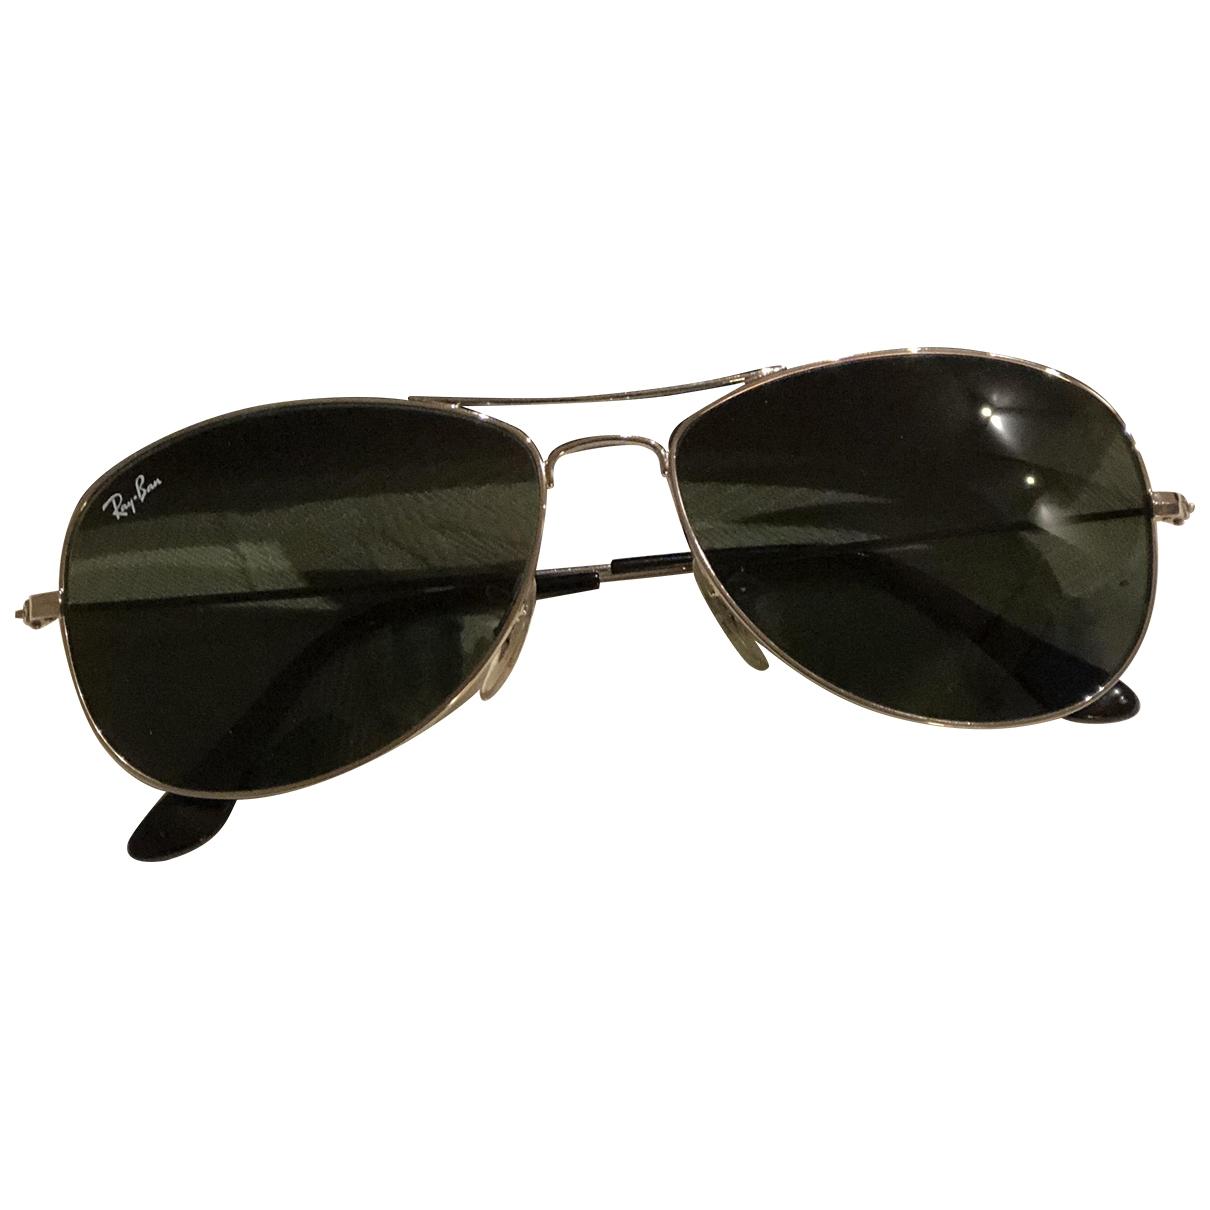 Ray-ban Aviator Anthracite Metal Sunglasses for Men \N